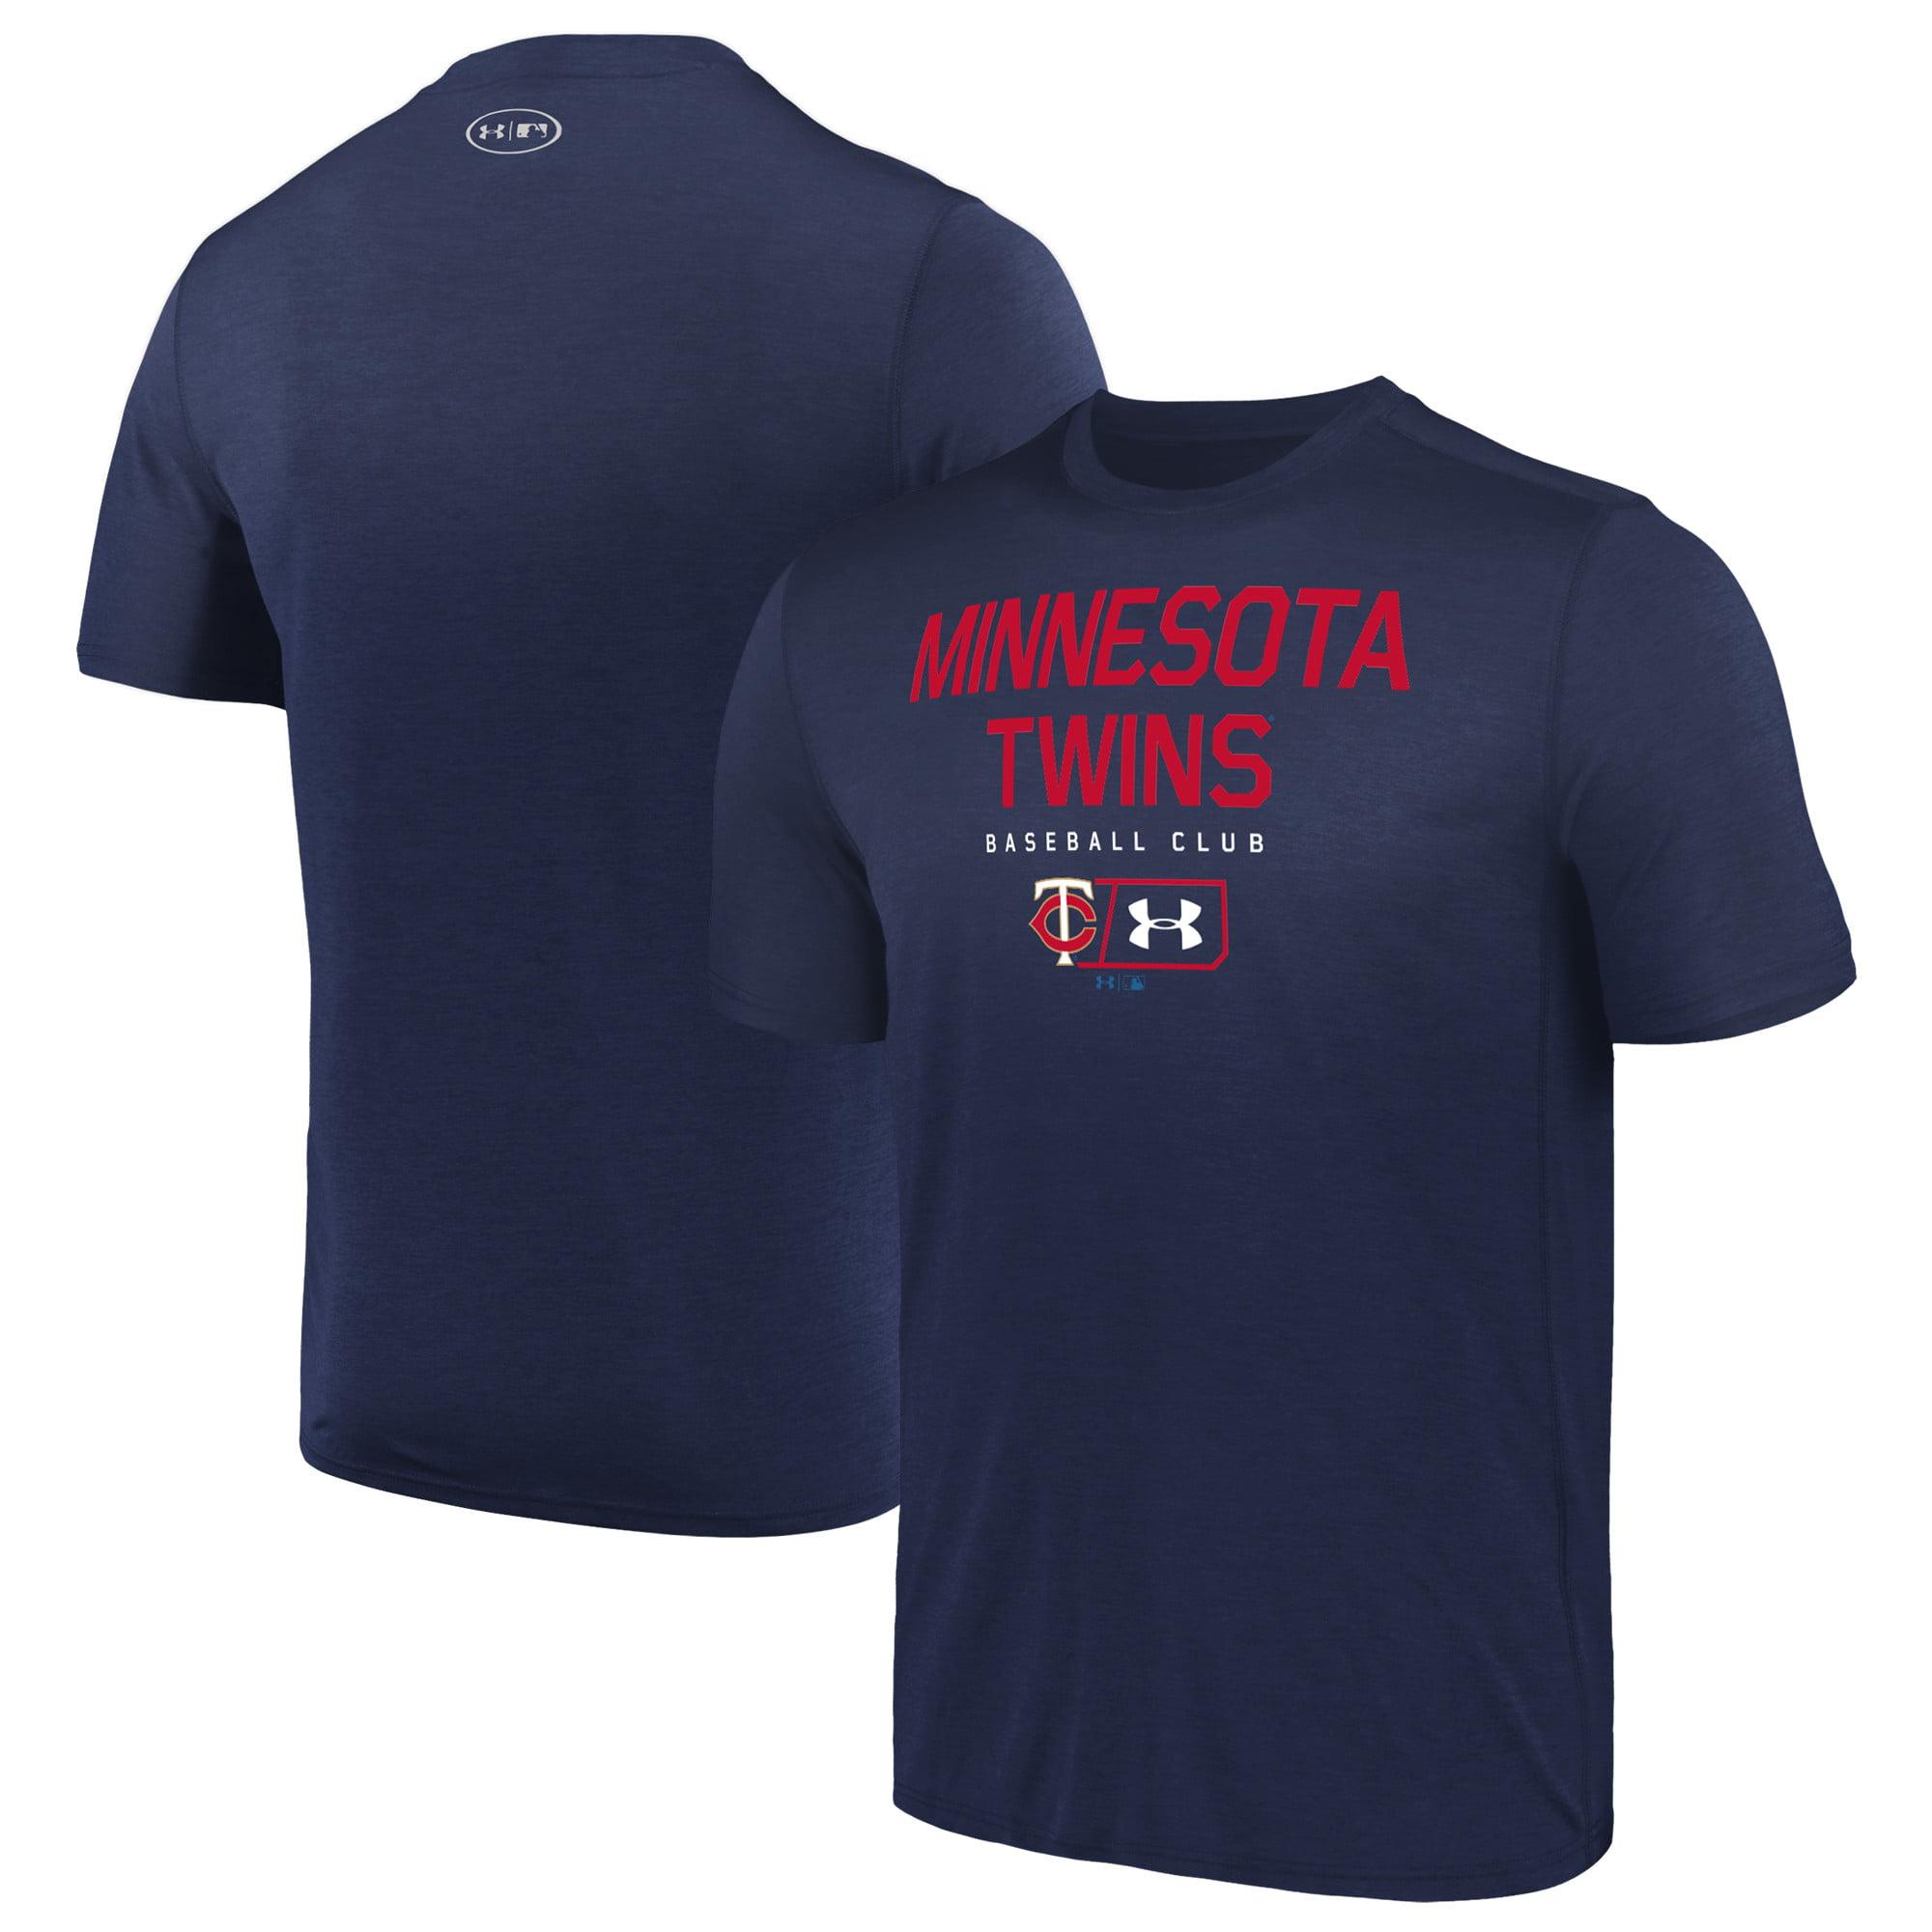 Minnesota Twins Under Armour City Proud Performance T-Shirt - Navy